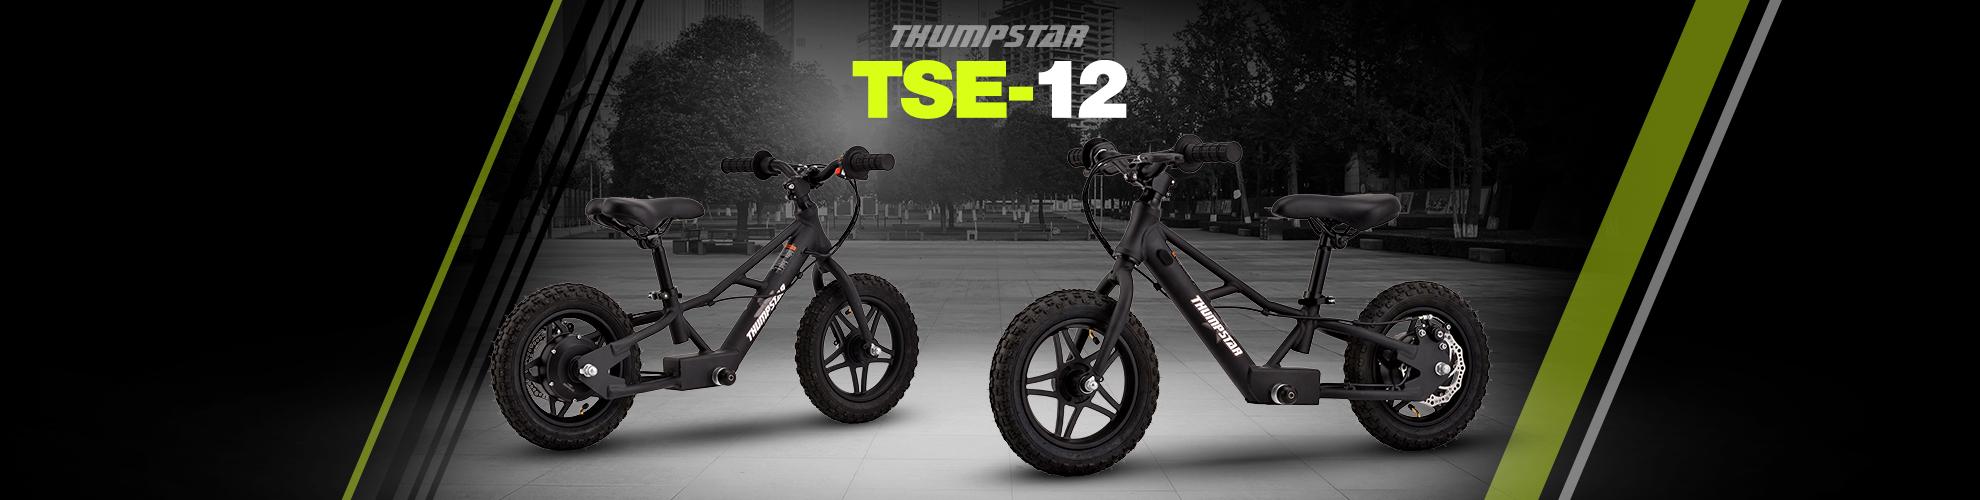 Thumpstar TSE12 | Electric Balance Bike Banner for Desktop